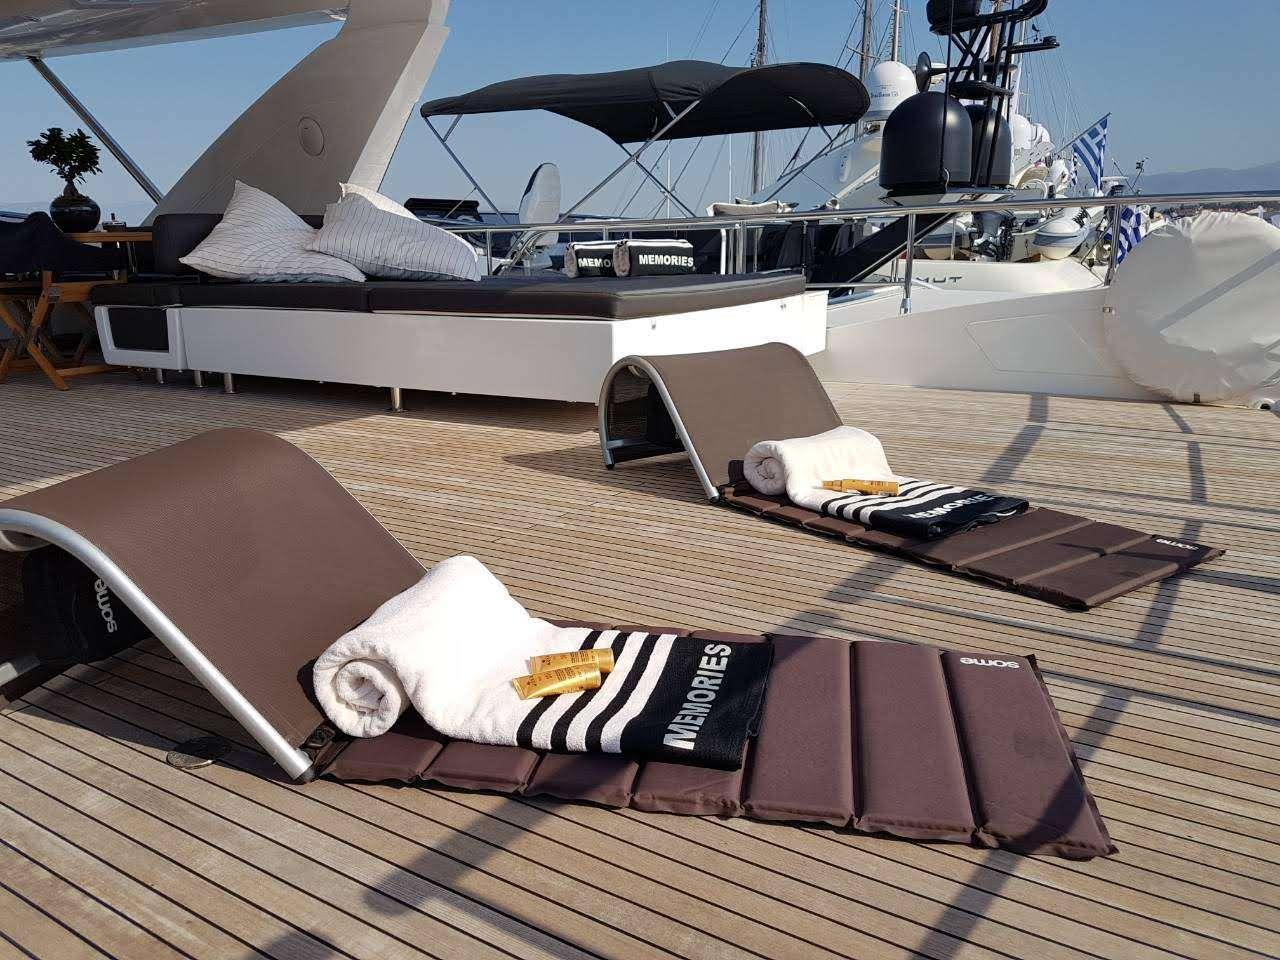 motor yacht MEMORIES